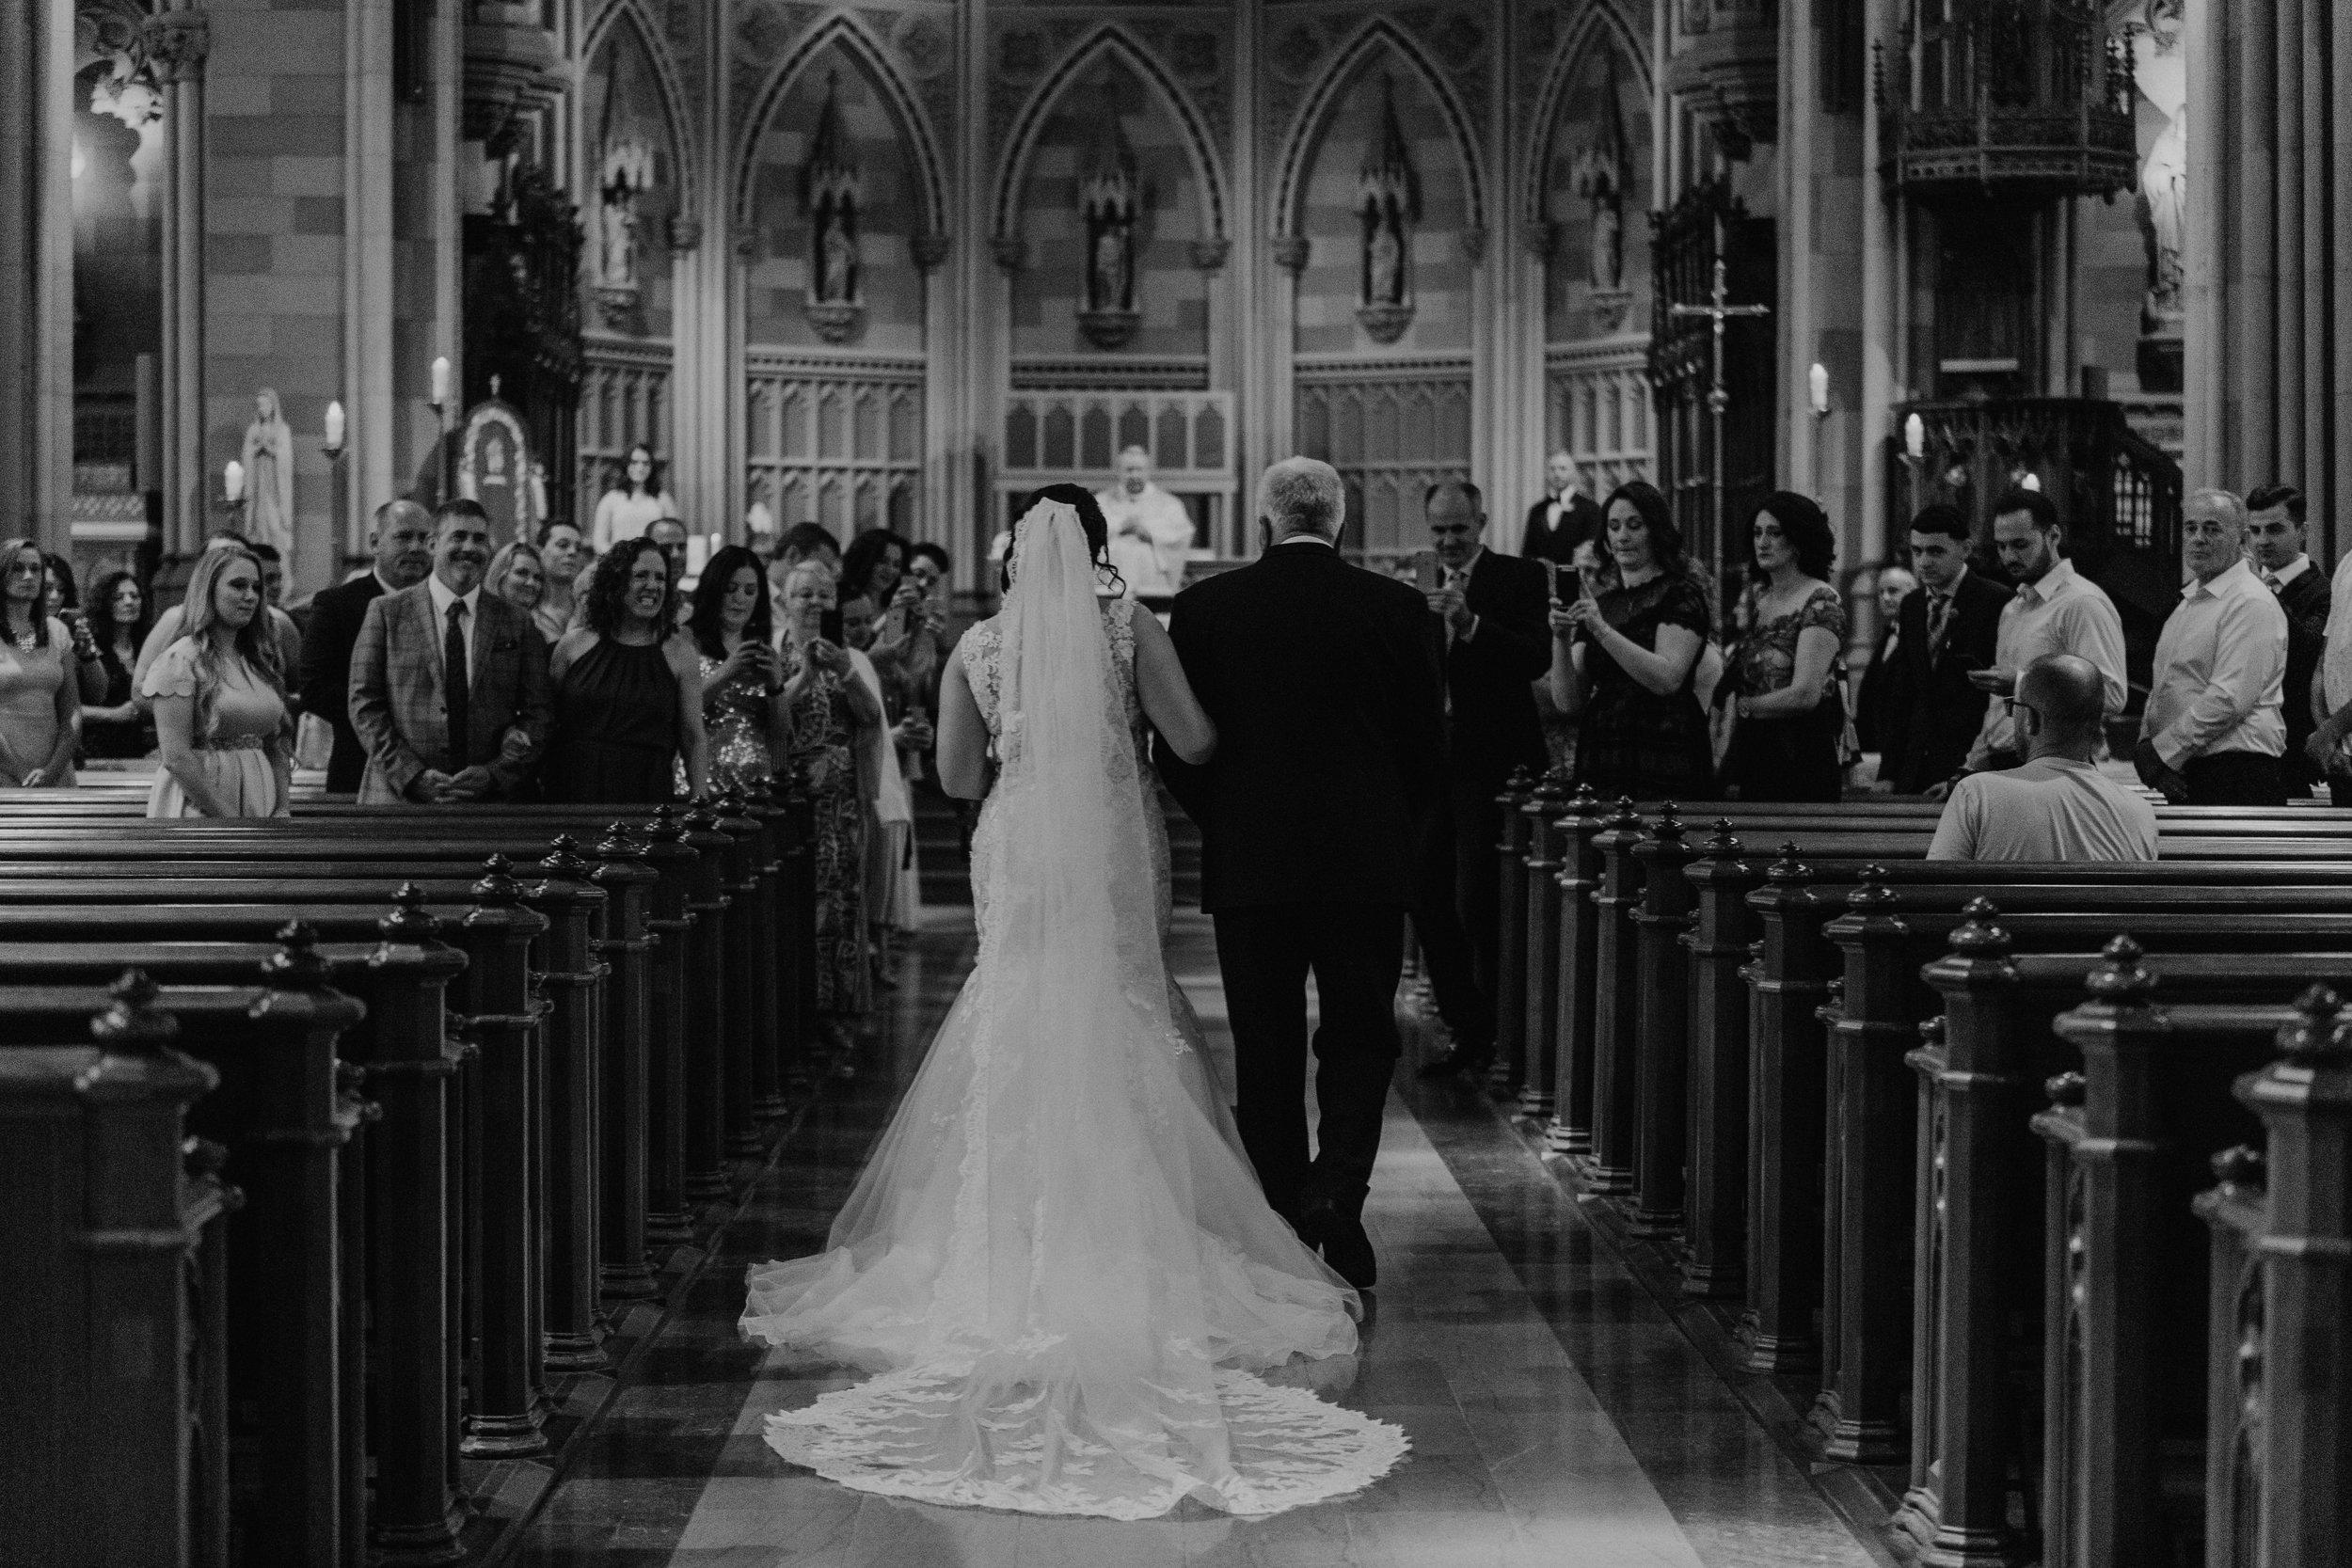 albany-new-york-wedding-20.jpg